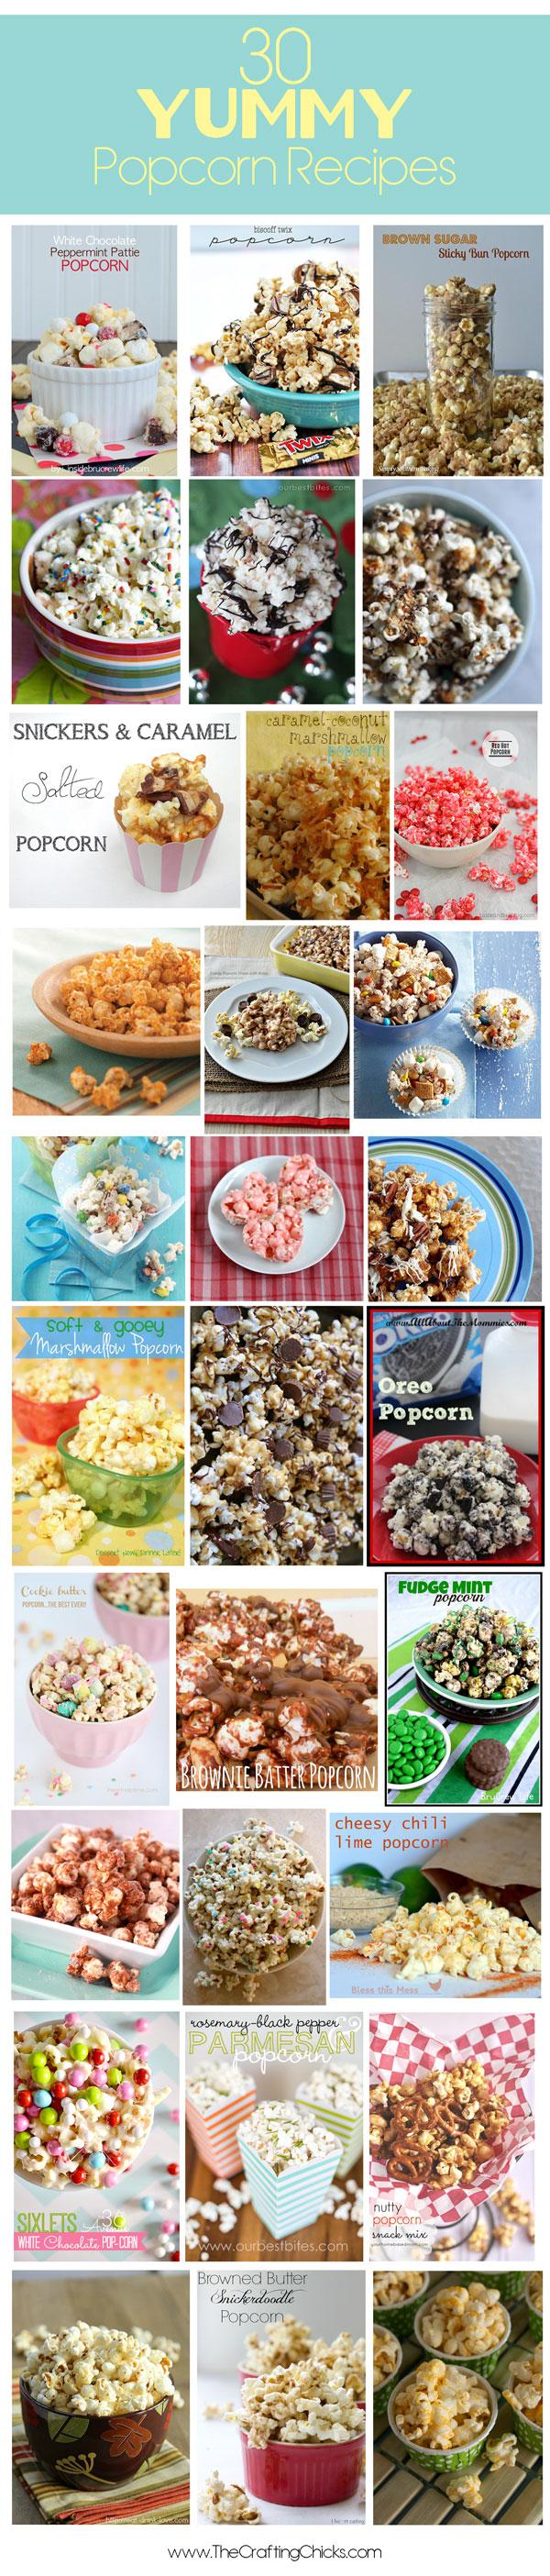 Popcorn-title